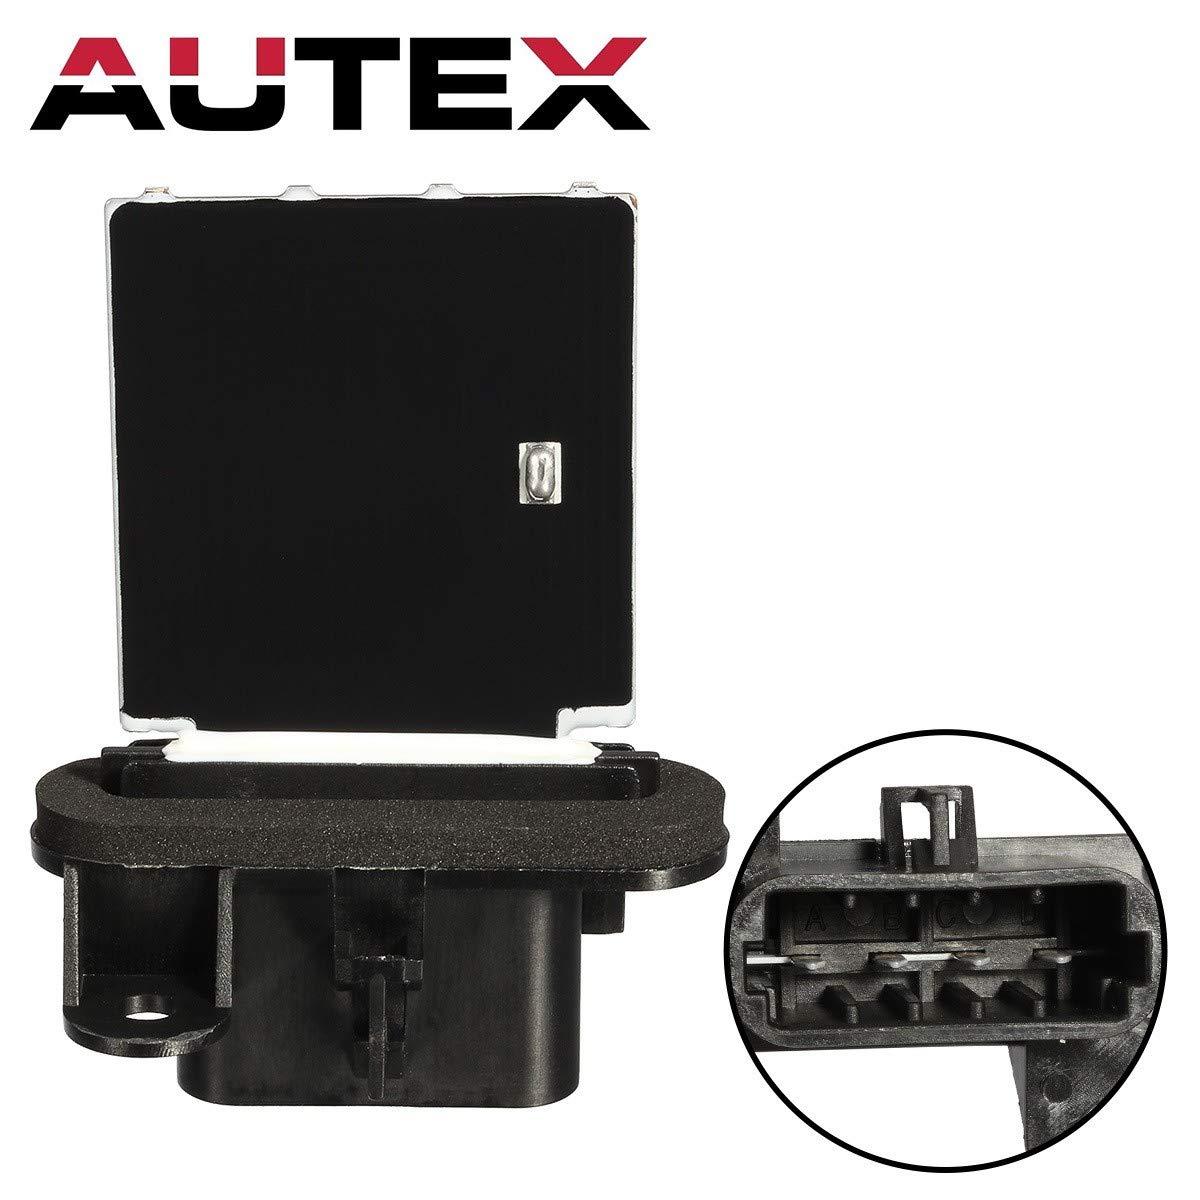 AUTEX Manual HVAC Blower Motor Resistor RU464 10398065 1580577 15818910 52486864 Replacement for 2006 2007 2008 2009 2010 Chevy Cobalt Hhr 2007 2008 2009 2010 Pontiac G5 2005 2006 Pontiac Pursuit